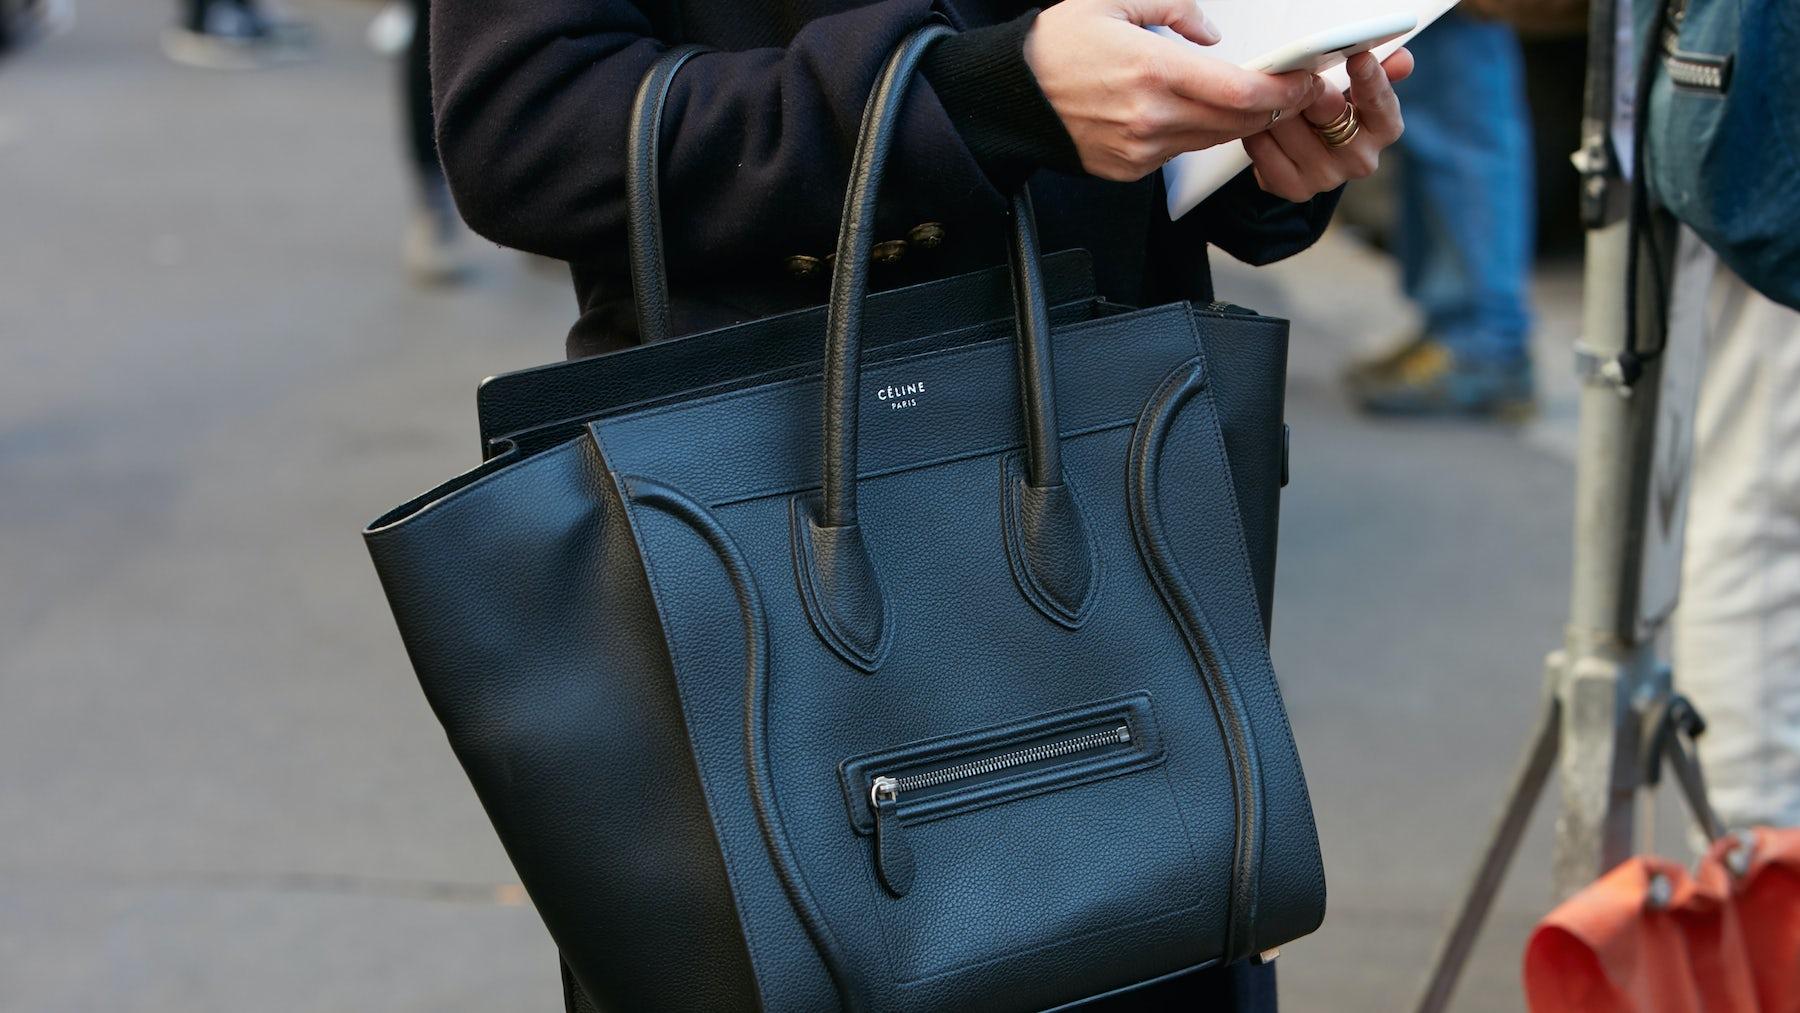 Céline handbag | Source: Shutterstock